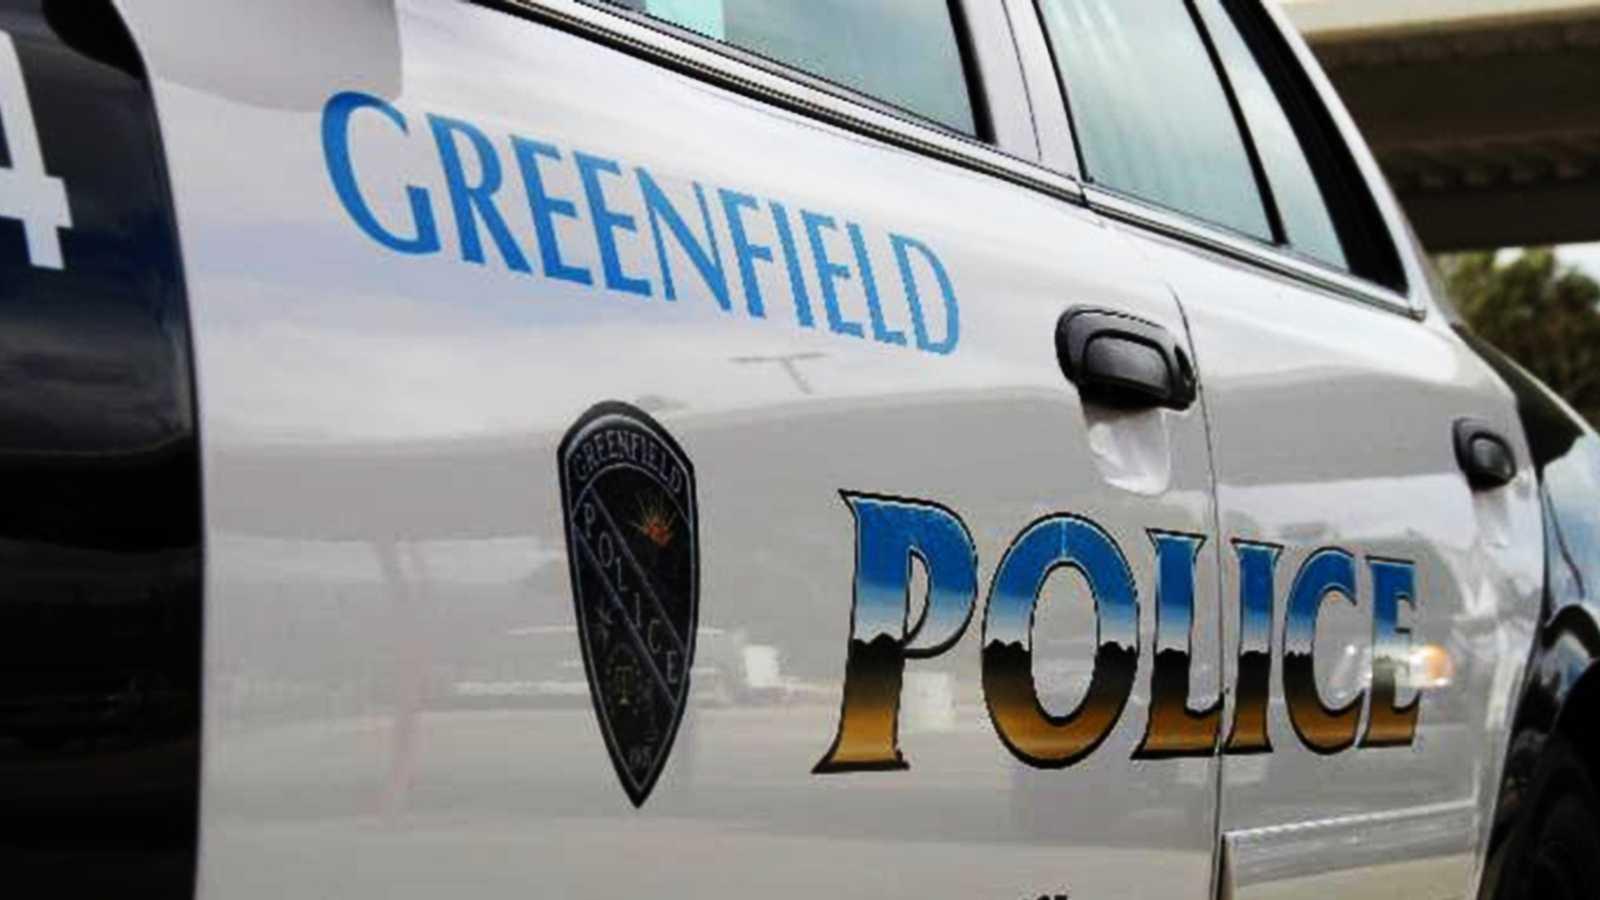 greenfield police generic.jpg